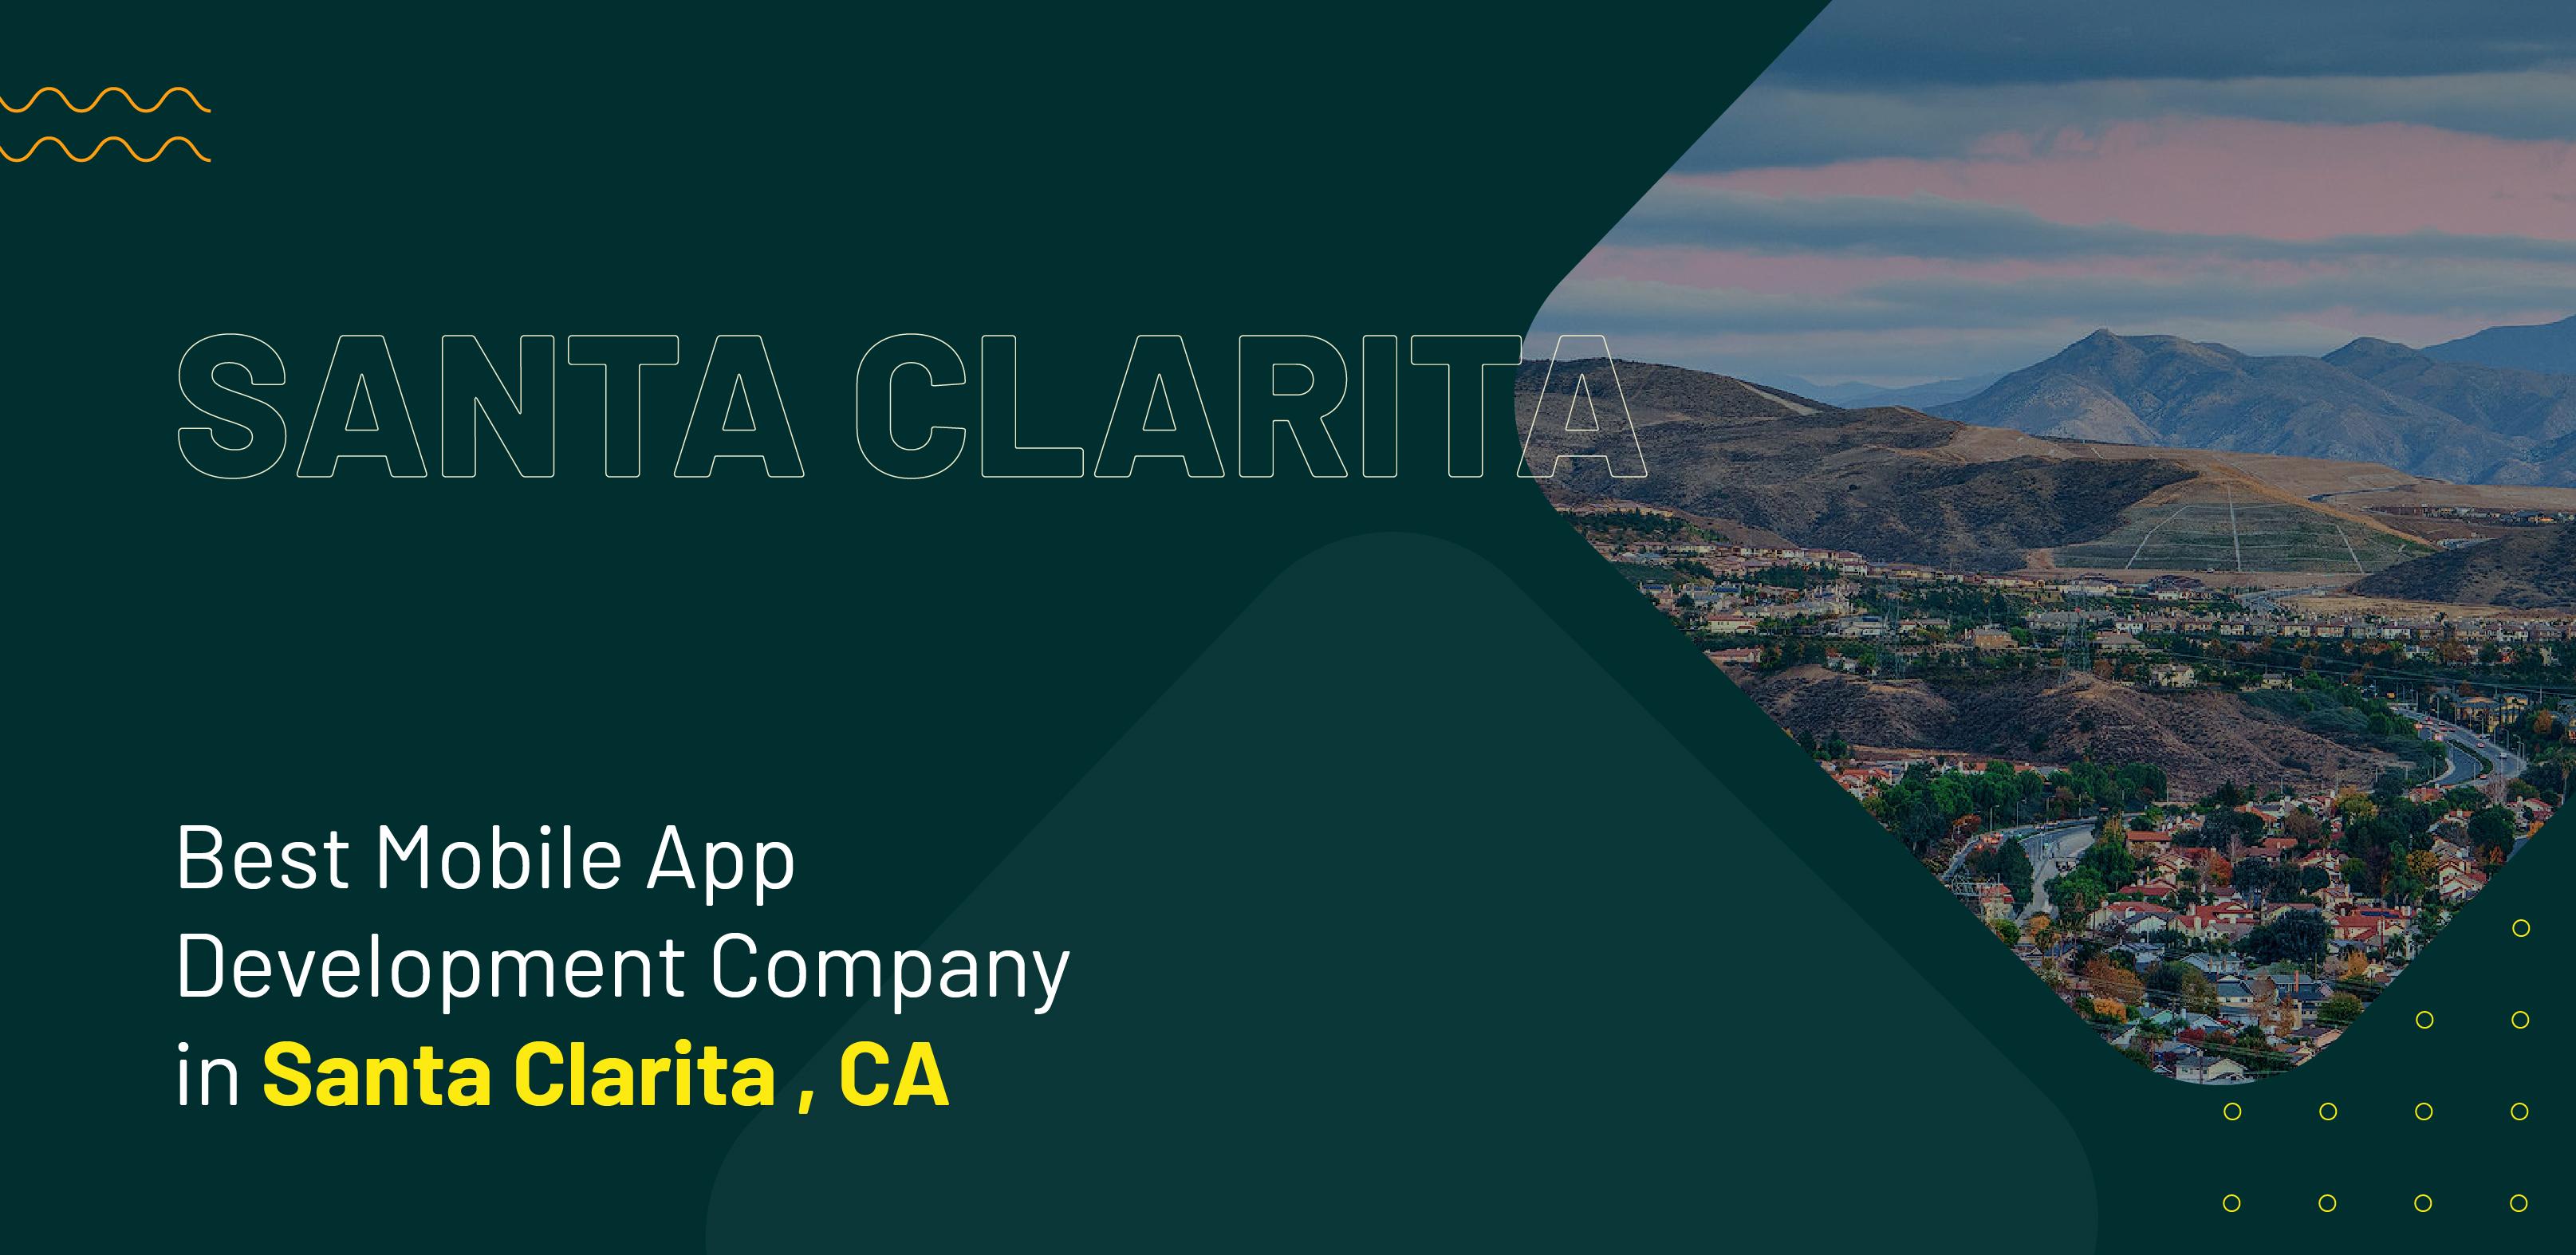 Best Mobile App Development Company in Santa Clarita, CA - WebClues Infotech